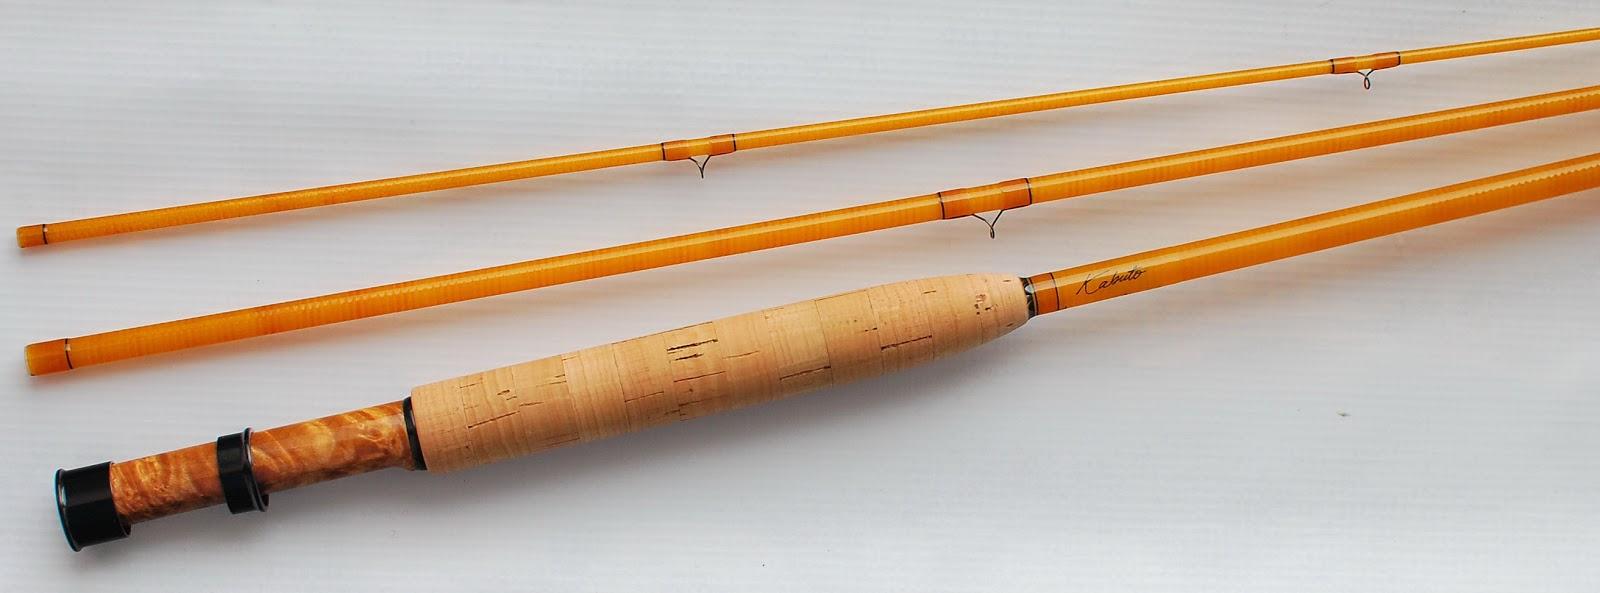 The fiberglass manifesto tightloop fly rods kabuto 7033 build for Fiberglass fishing rods